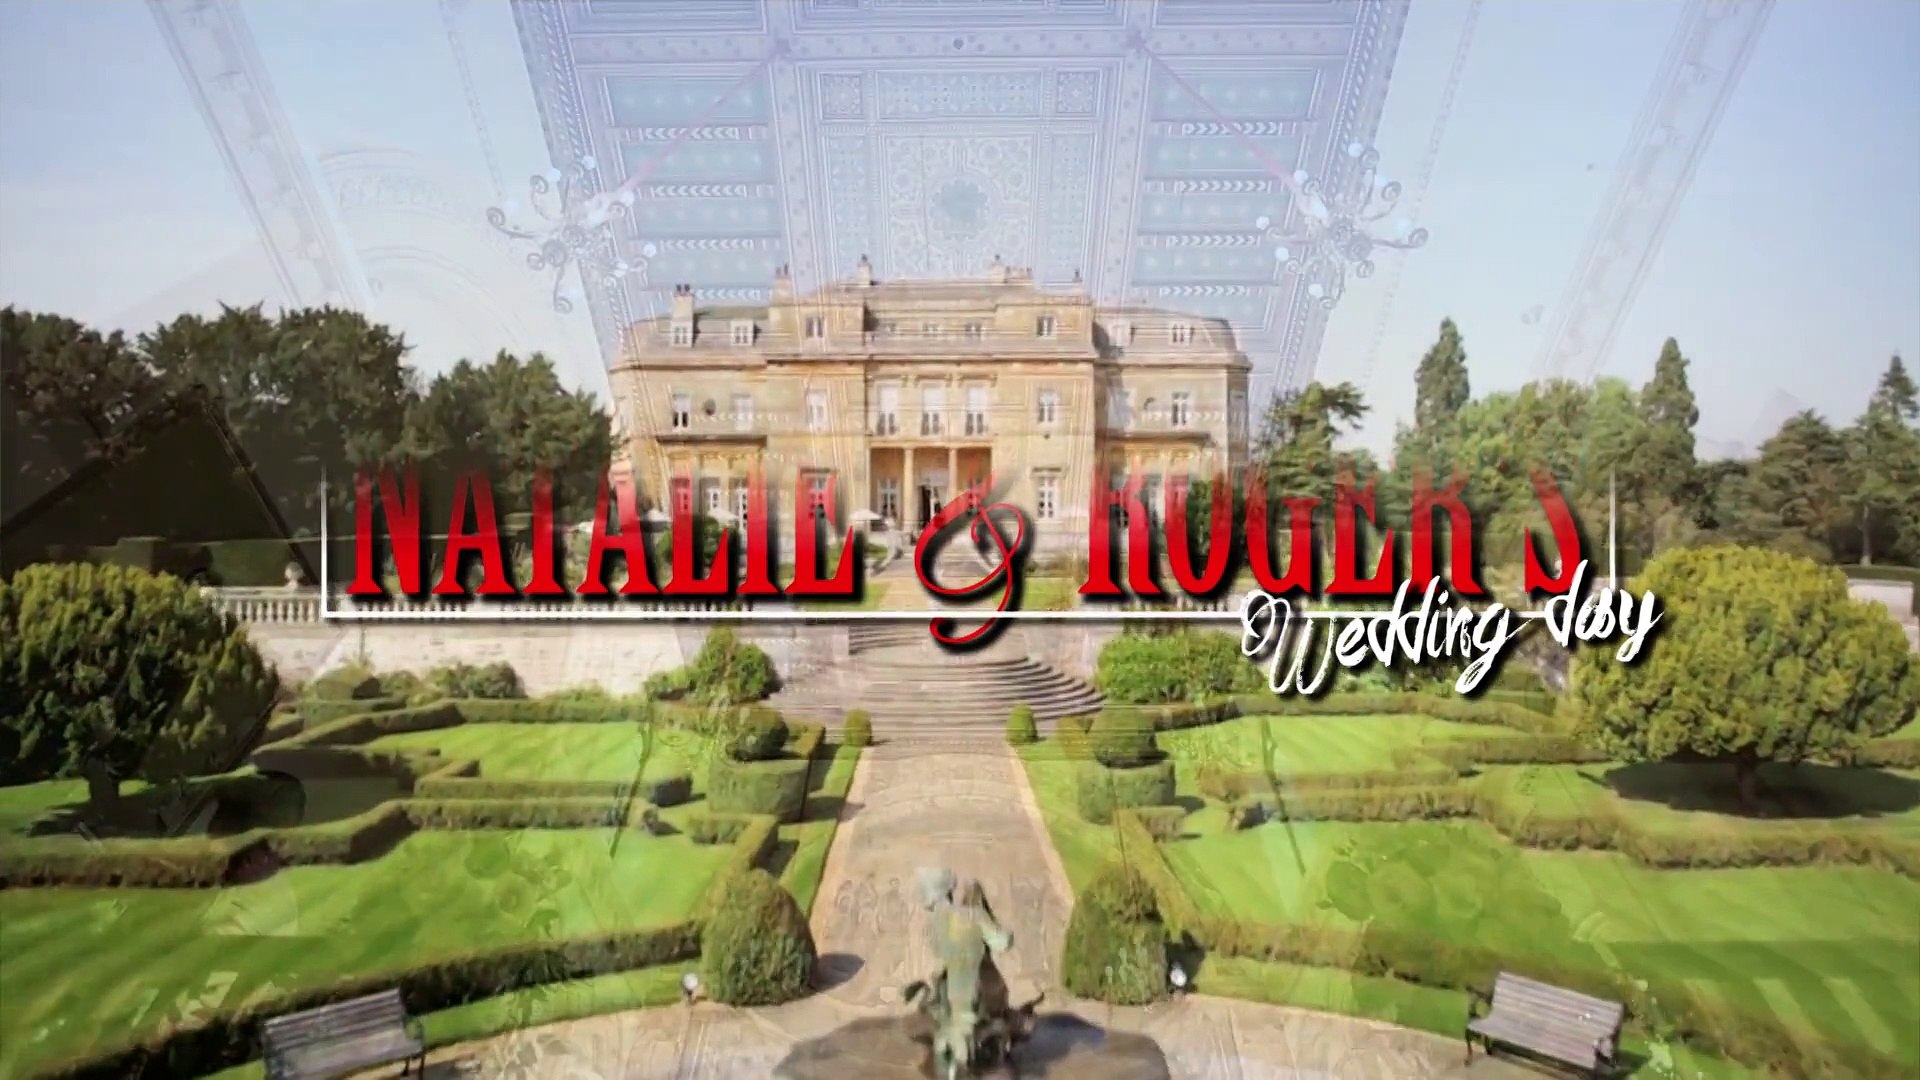 African Wedding Videos and Photos - Luton Hoo - Cinematography by Diamond Studios